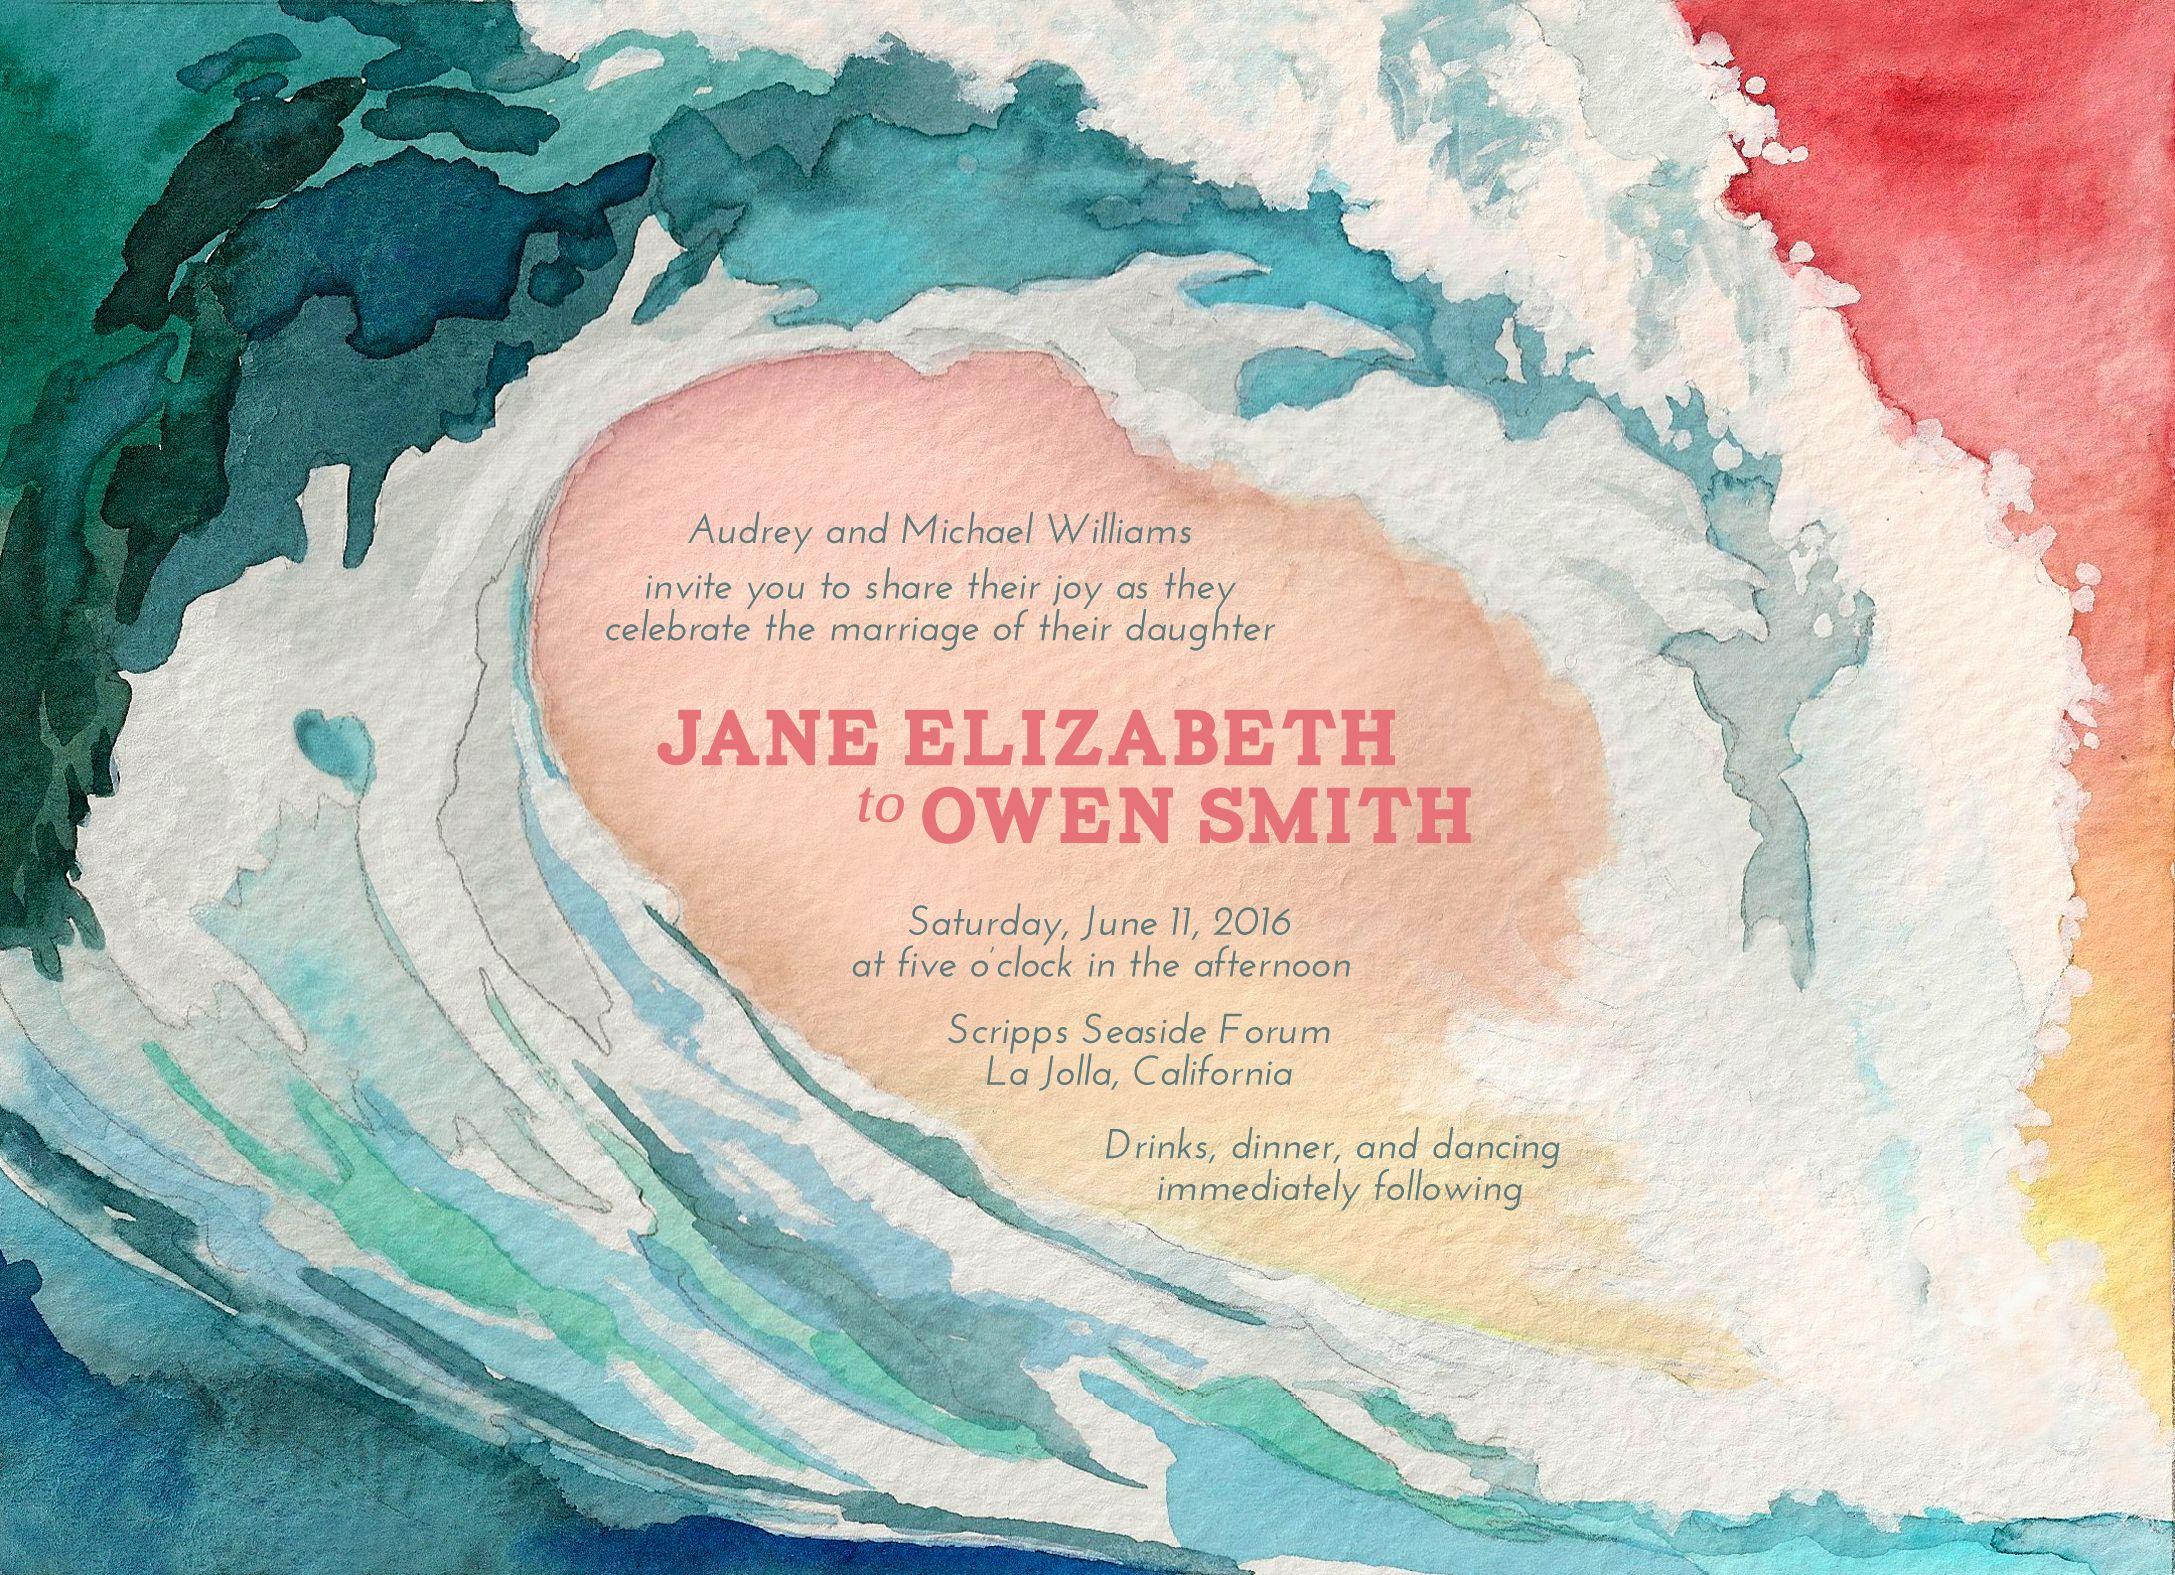 Ocean Wave watercolor Wedding Invitation by Arelor. https://arelor ...